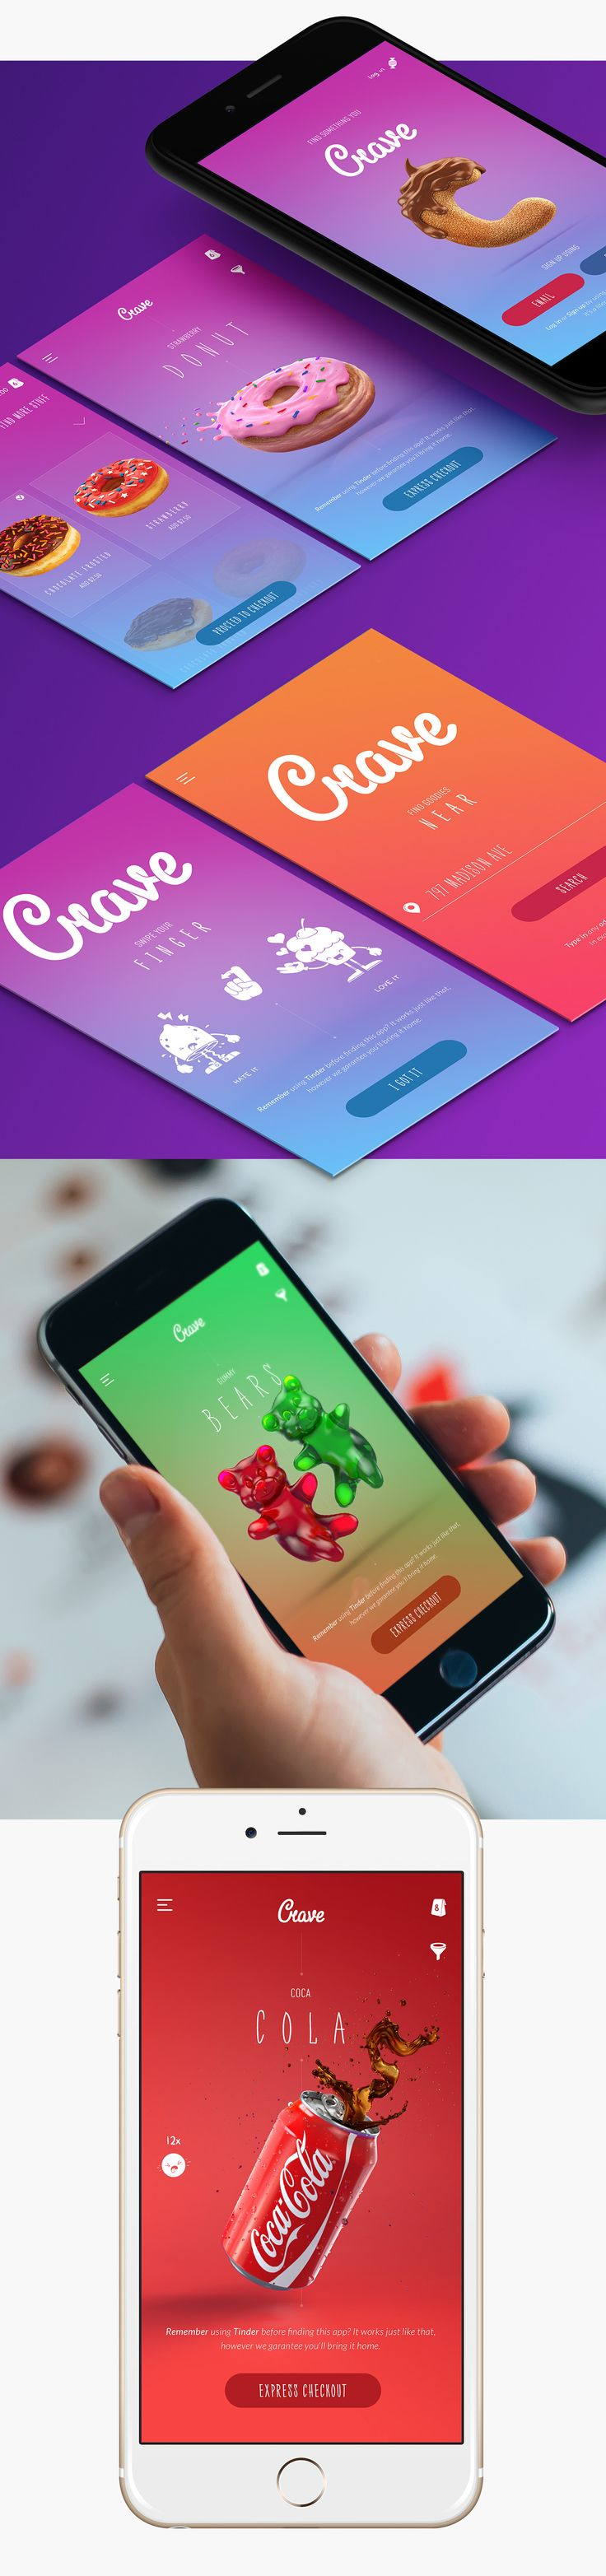 Crave App on Behance